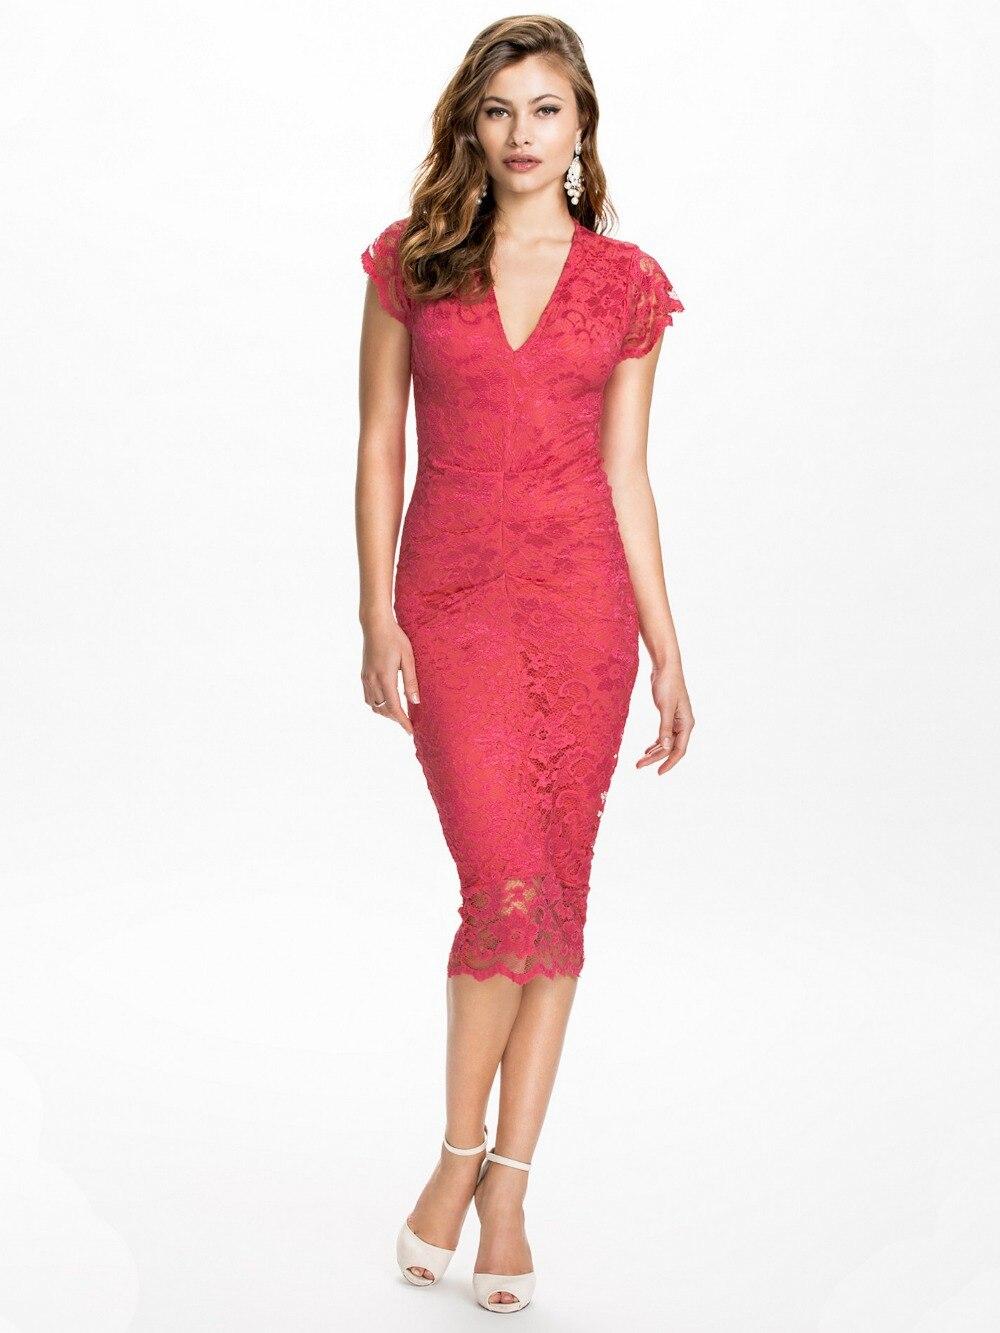 Lace dress knee length elegant